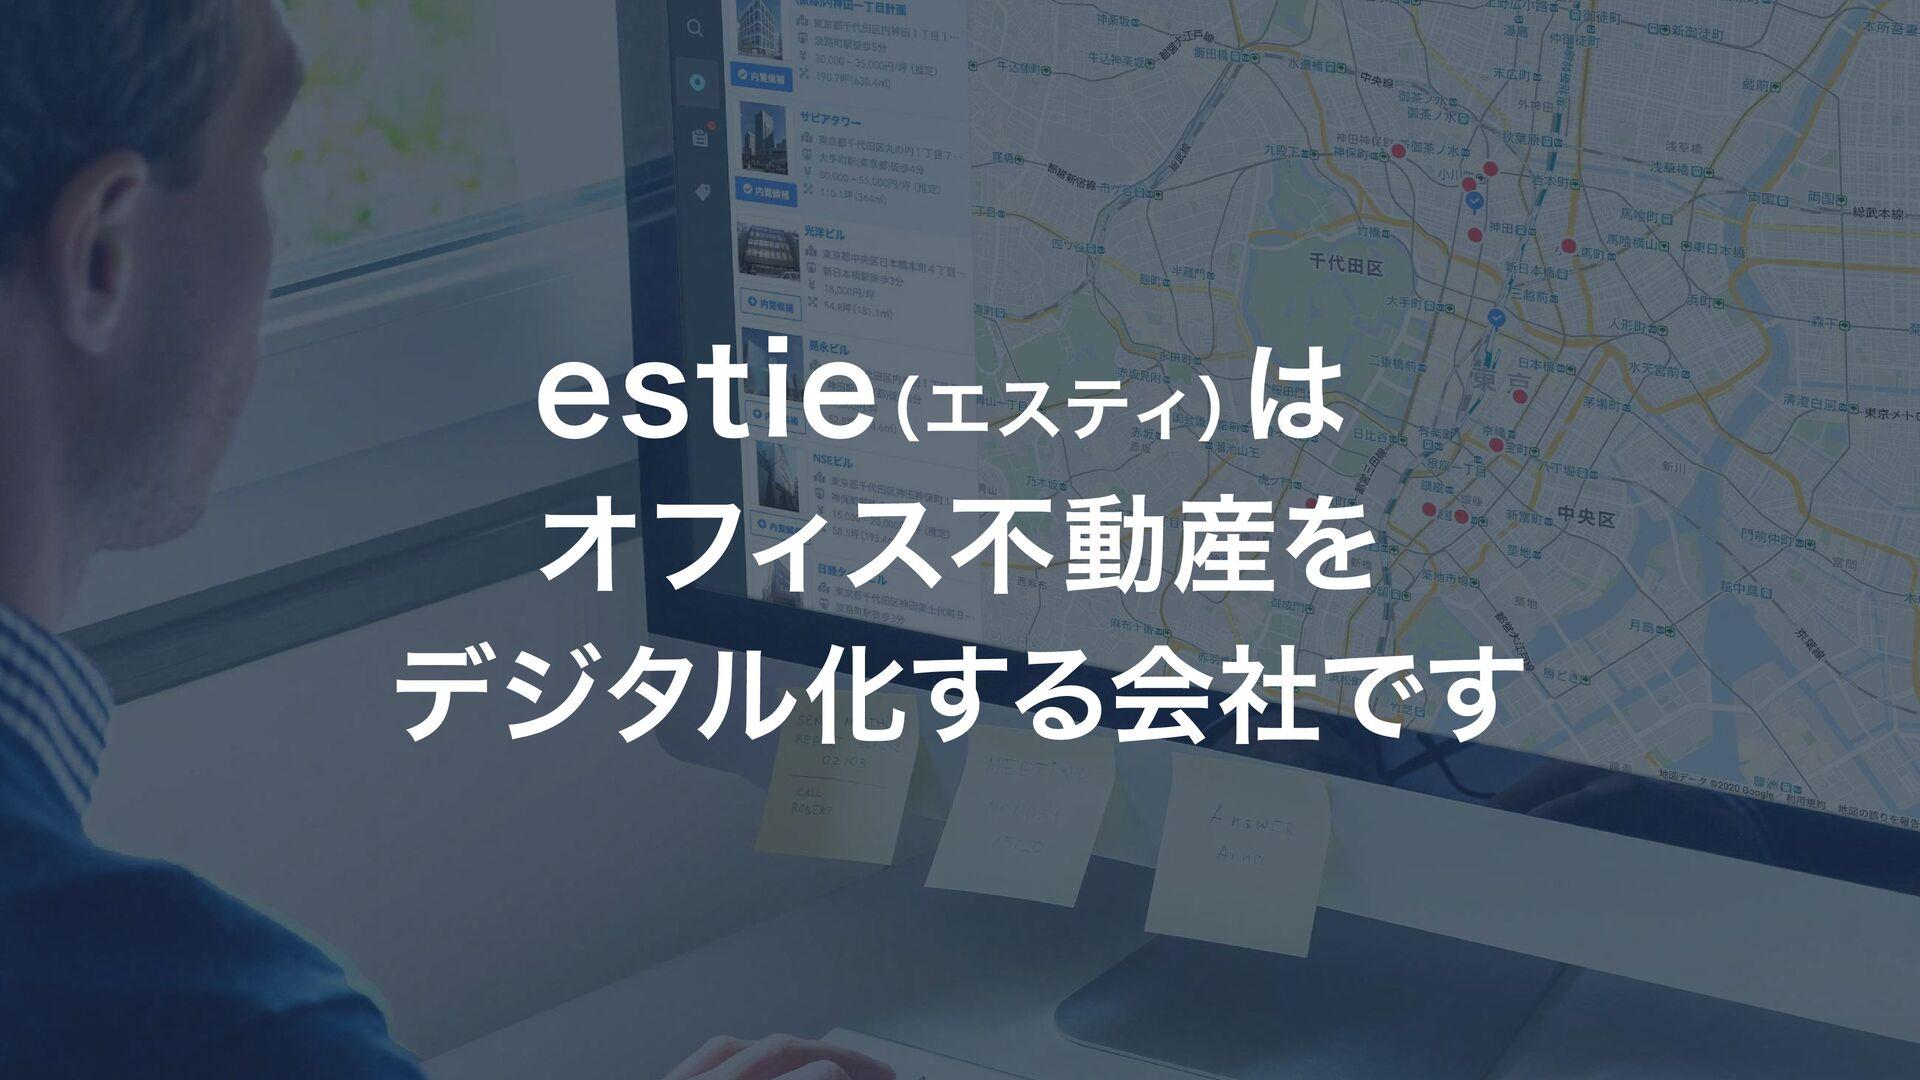 estie(エスティ) は  オフィス不動産を  デジタル化する会社です